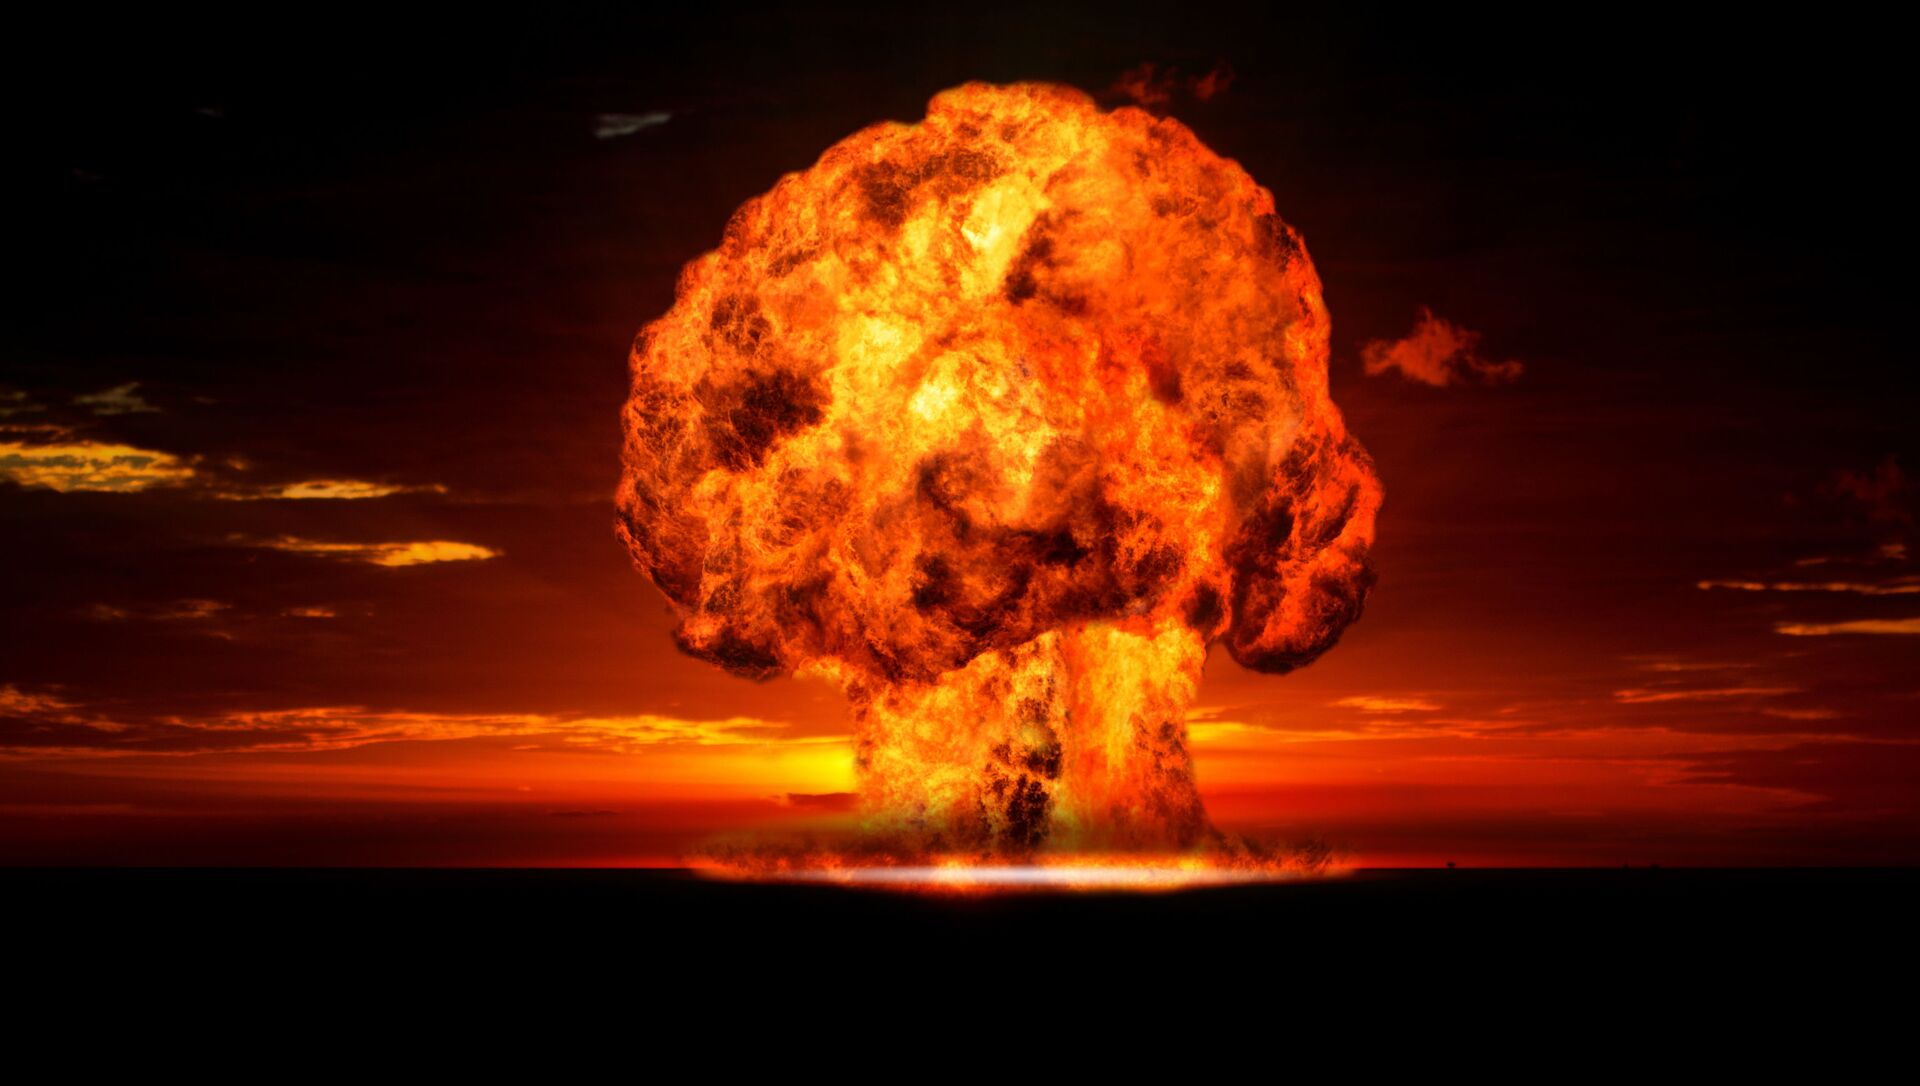 Jaderný výbuch - Sputnik Česká republika, 1920, 24.02.2021